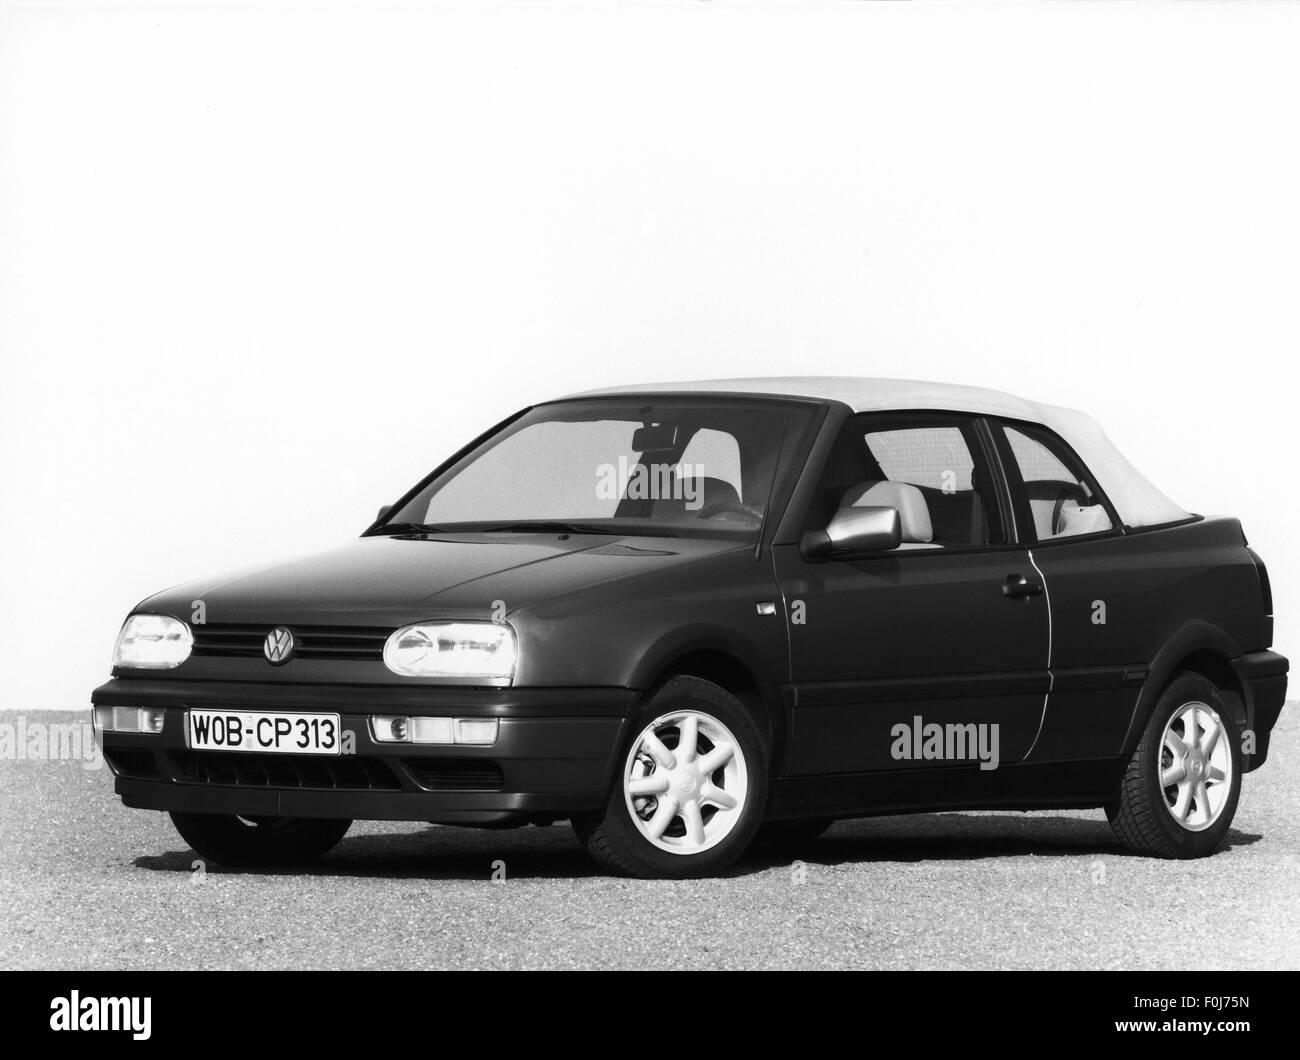 transport / transportation, car, vehicle variants, Volkswagen, VW Golf Mk3 convertible, 1990s, Additional-Rights - Stock Image